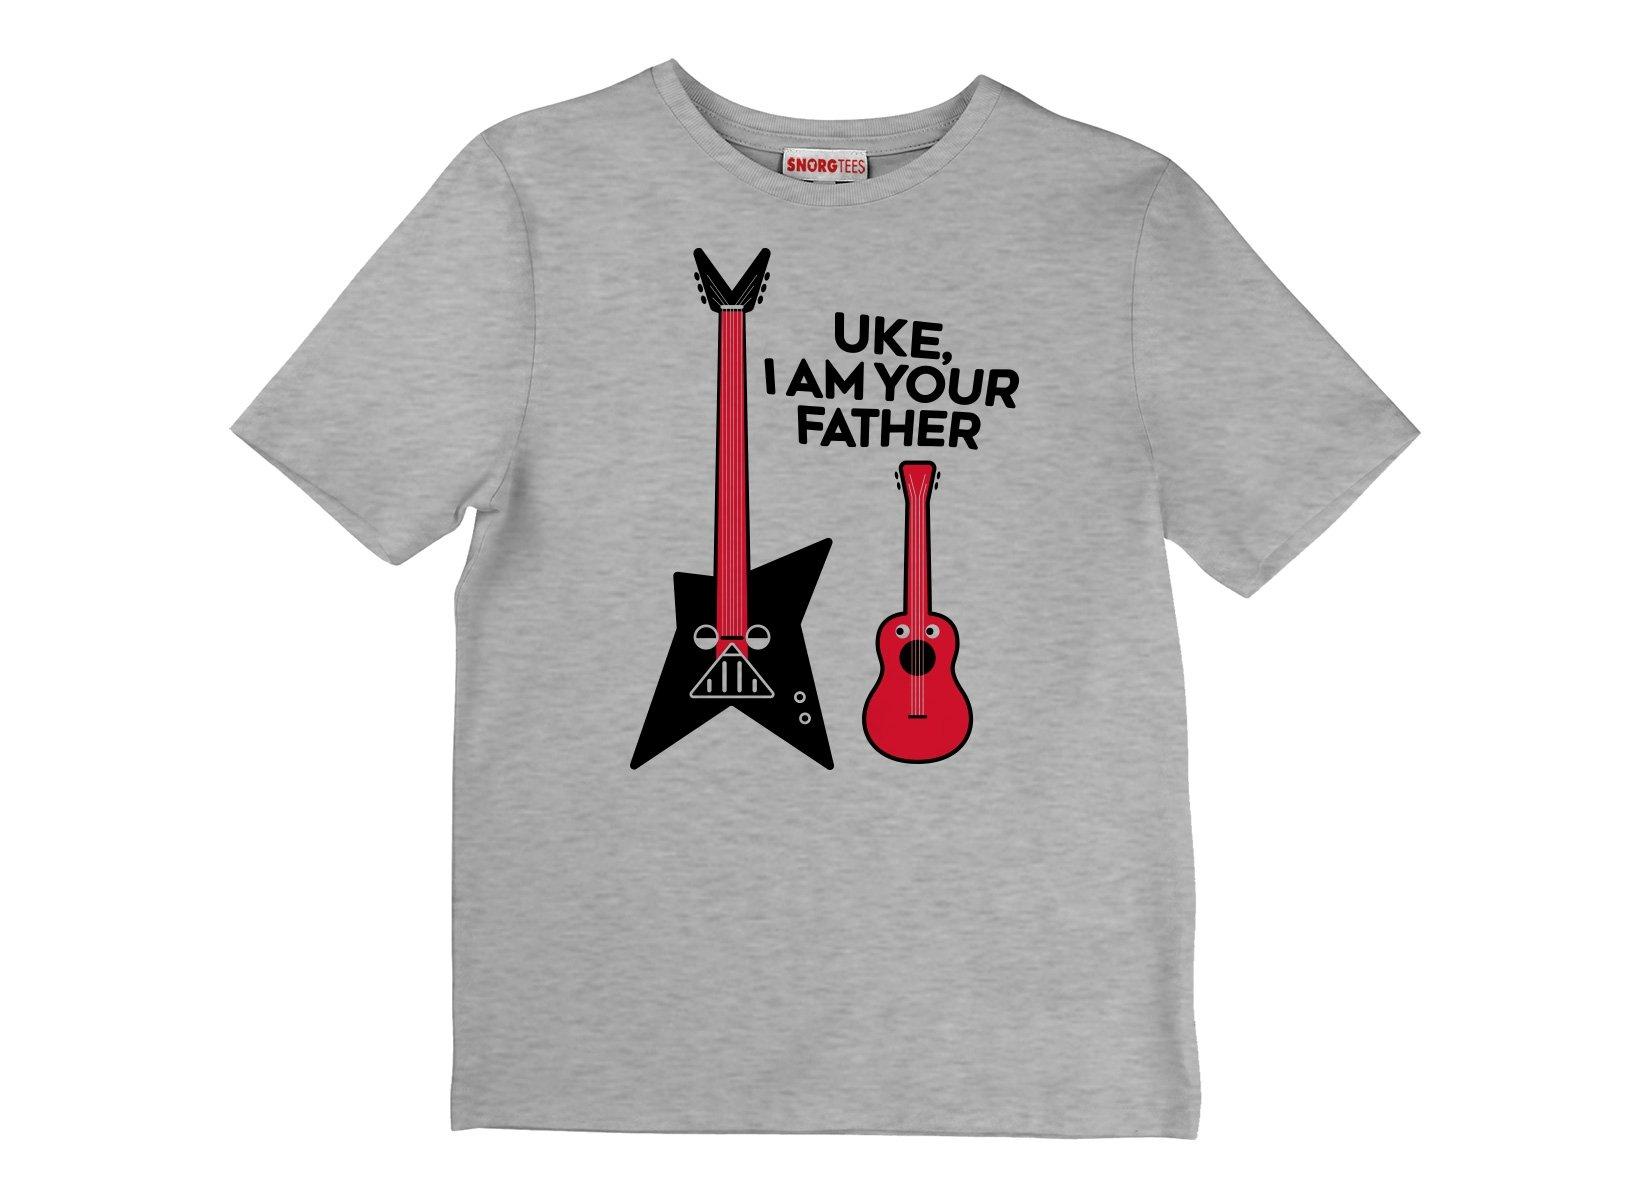 Uke, I Am Your Father on Kids T-Shirt